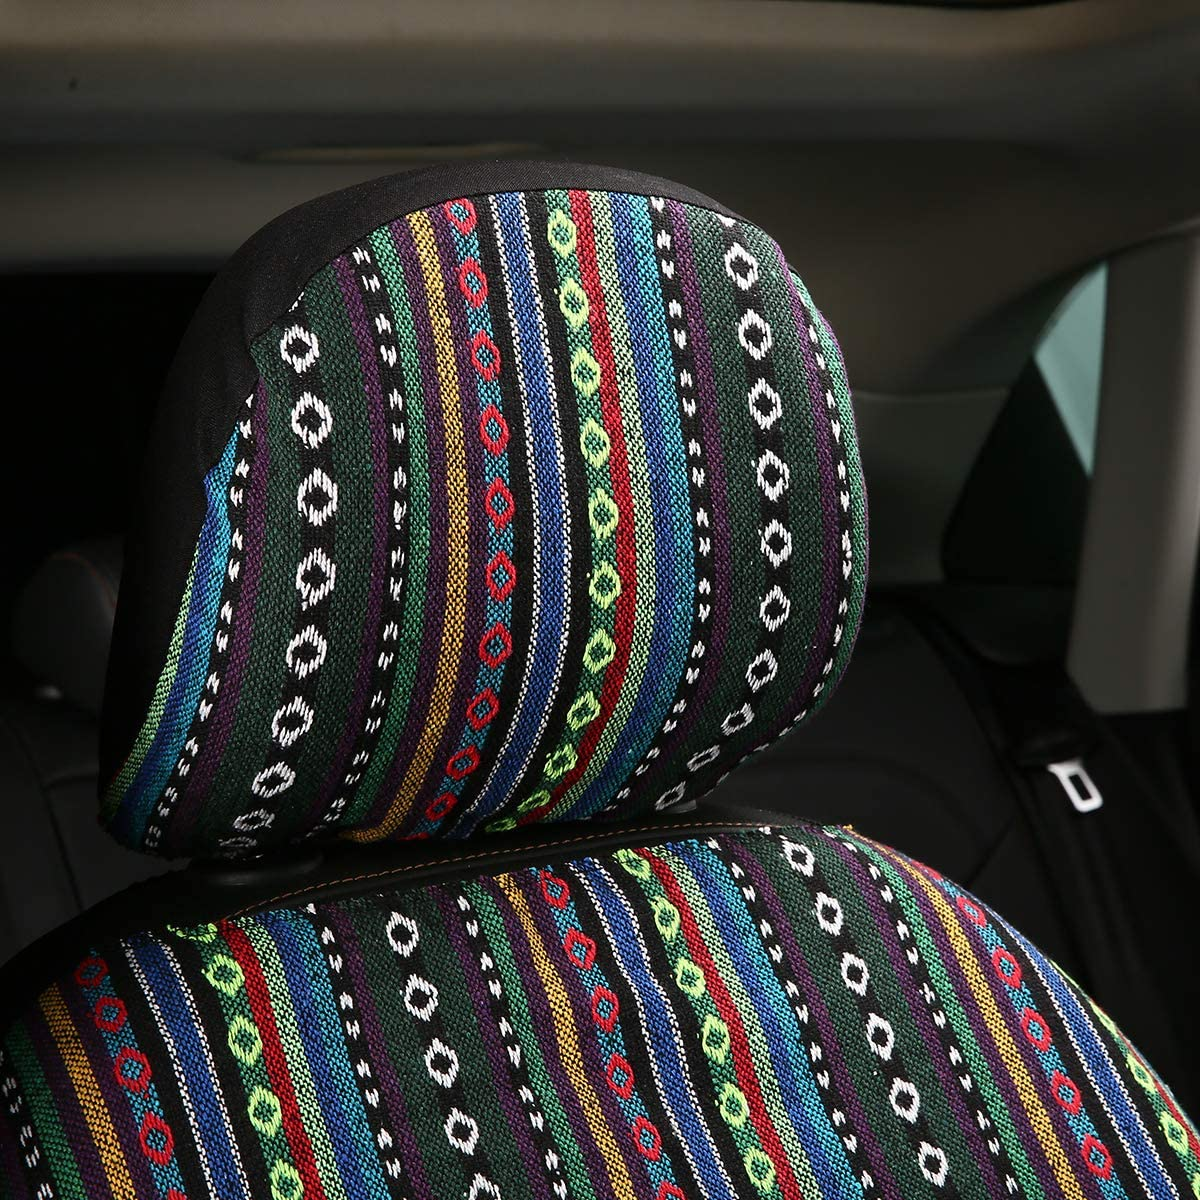 boxi-f SHAKAR Baja Blanket Car Seat Covers-Stripe Colorful Seat Covers